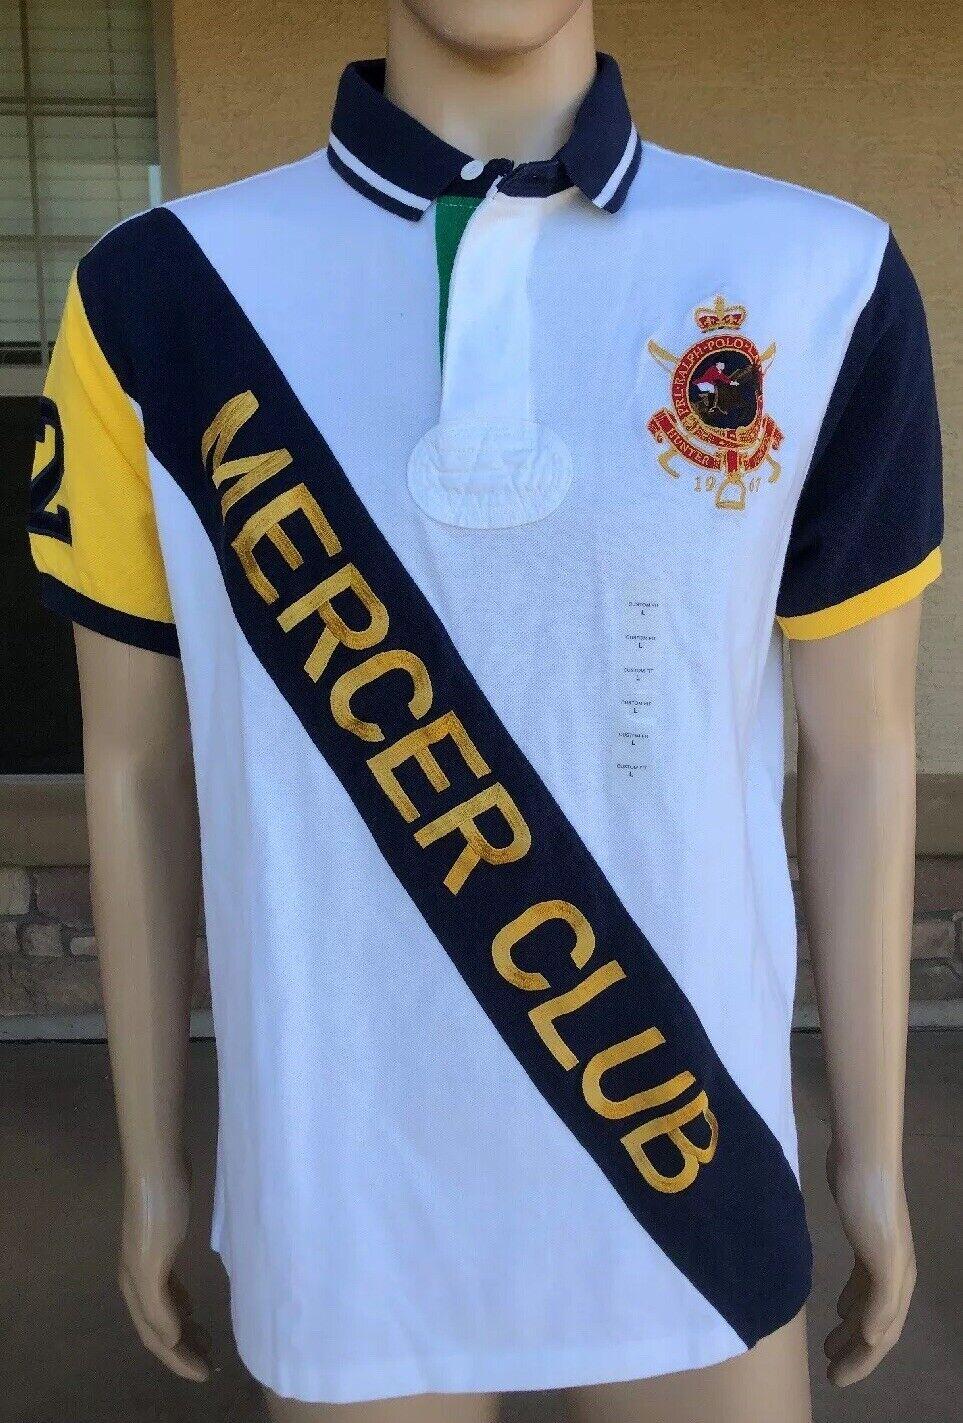 NWT Polo Ralph Lauren Shirt Mercer Club Hunter Jumper 1967 Size Large PRL